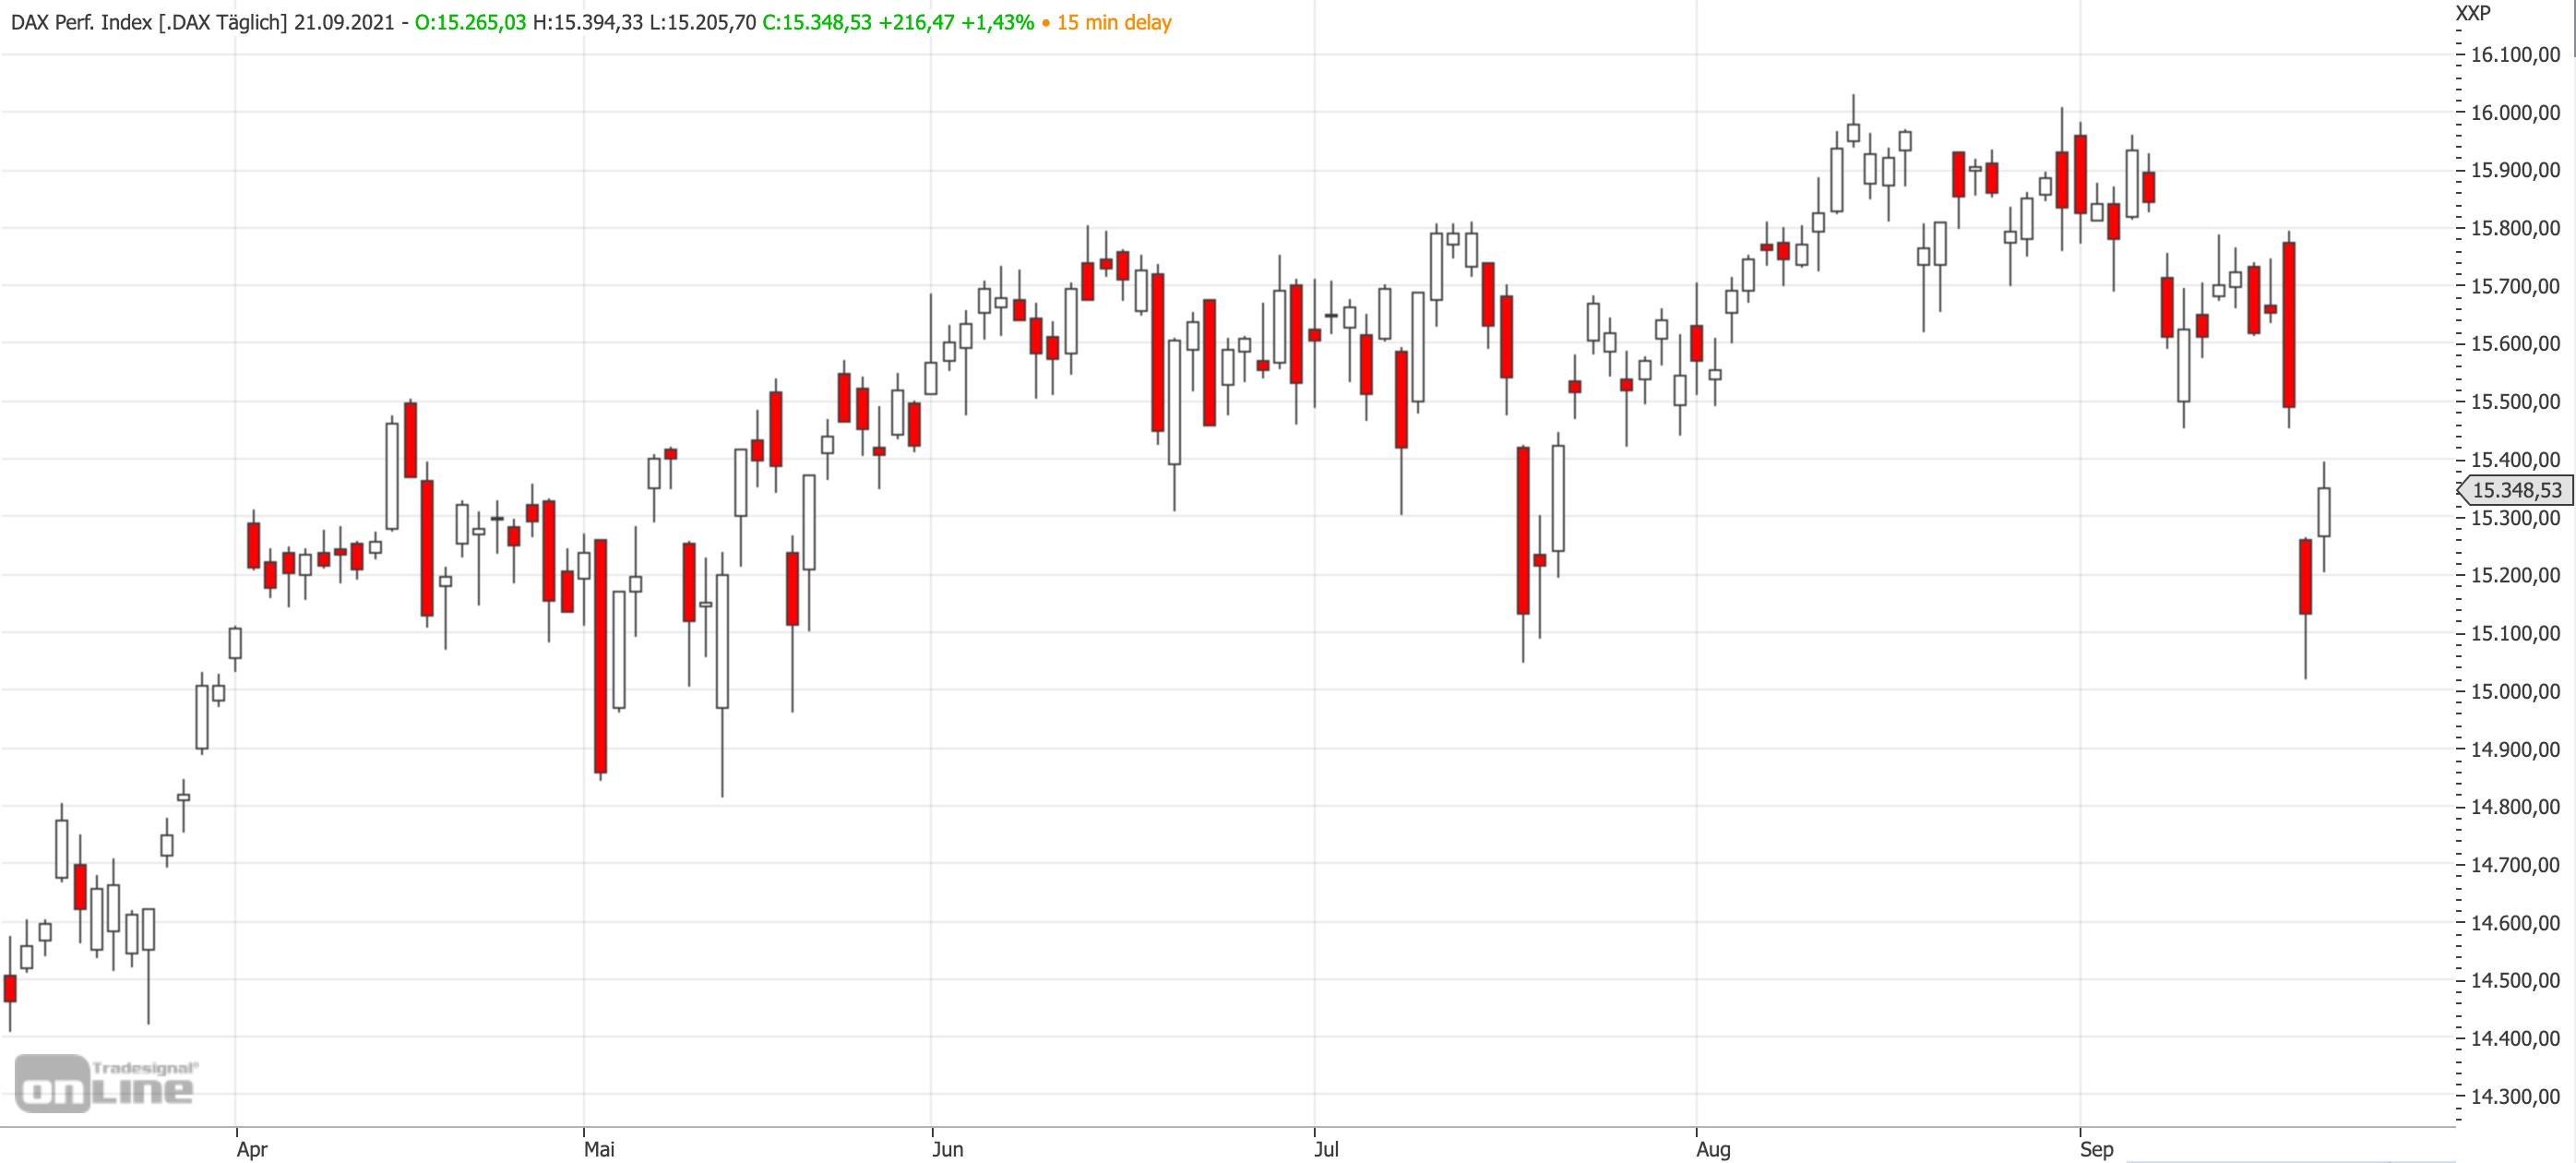 Mittelfristiger DAX-Chart am 21.09.2021